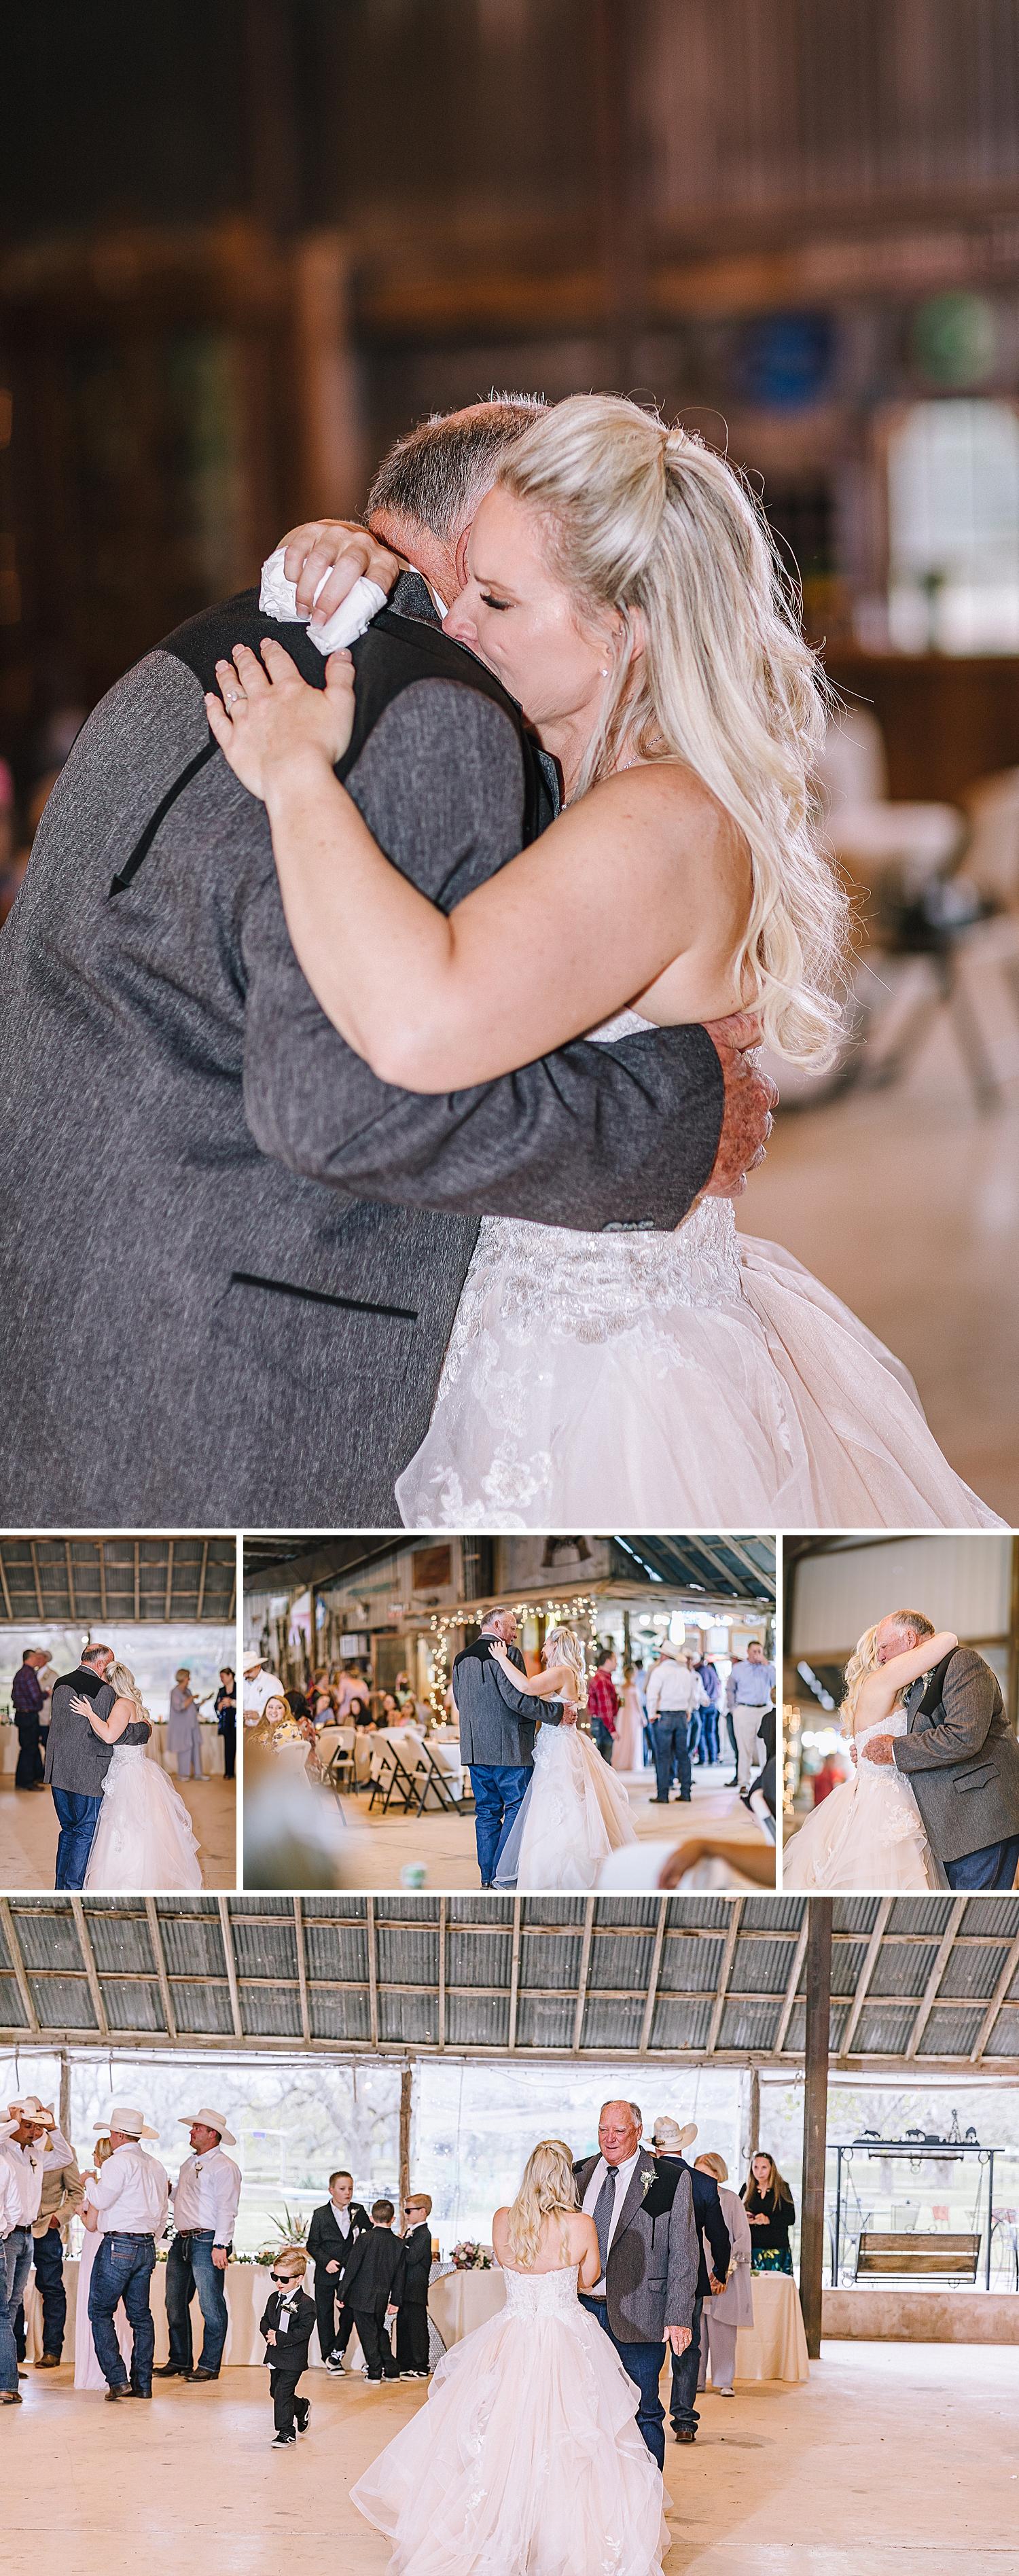 Rio-Cibilo-Ranch-Marion-Texas-Wedding-Rustic-Blush-Rose-Quartz-Details-Carly-Barton-Photography_0080.jpg